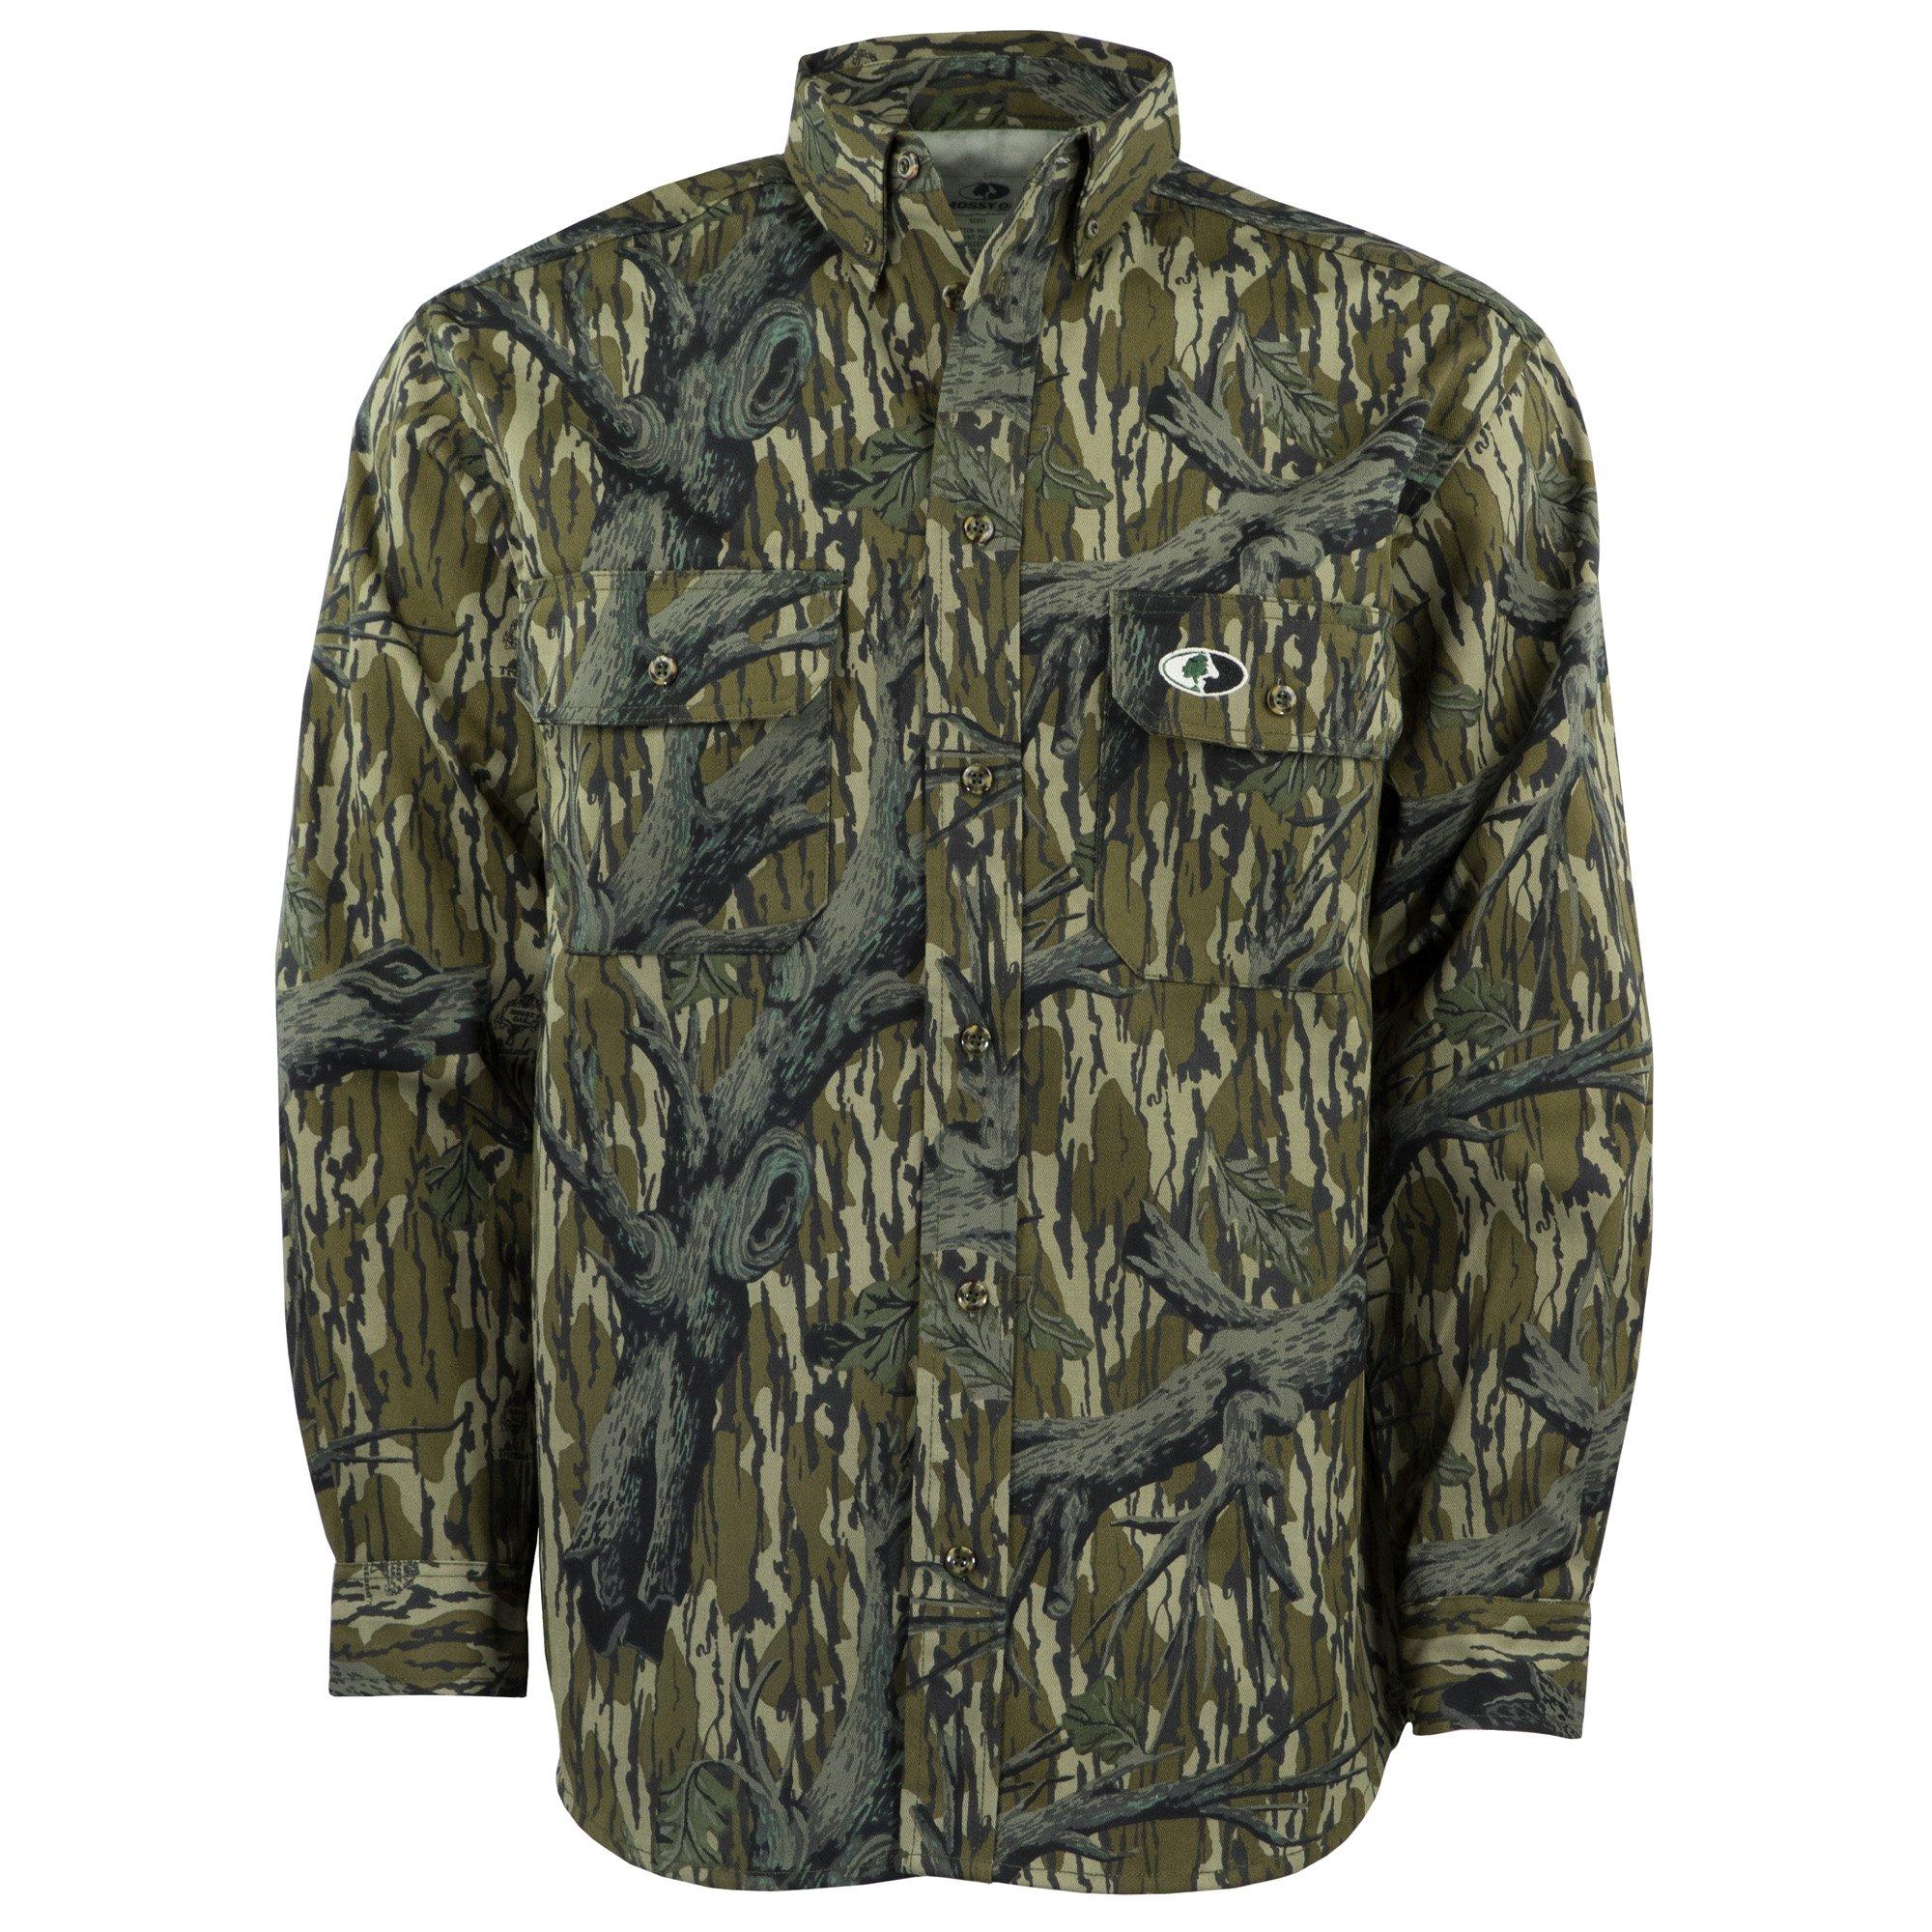 Mossy Oak Camouflage Cotton Mill Hunt Shirt, Original Treestand, 3X by Mossy Oak